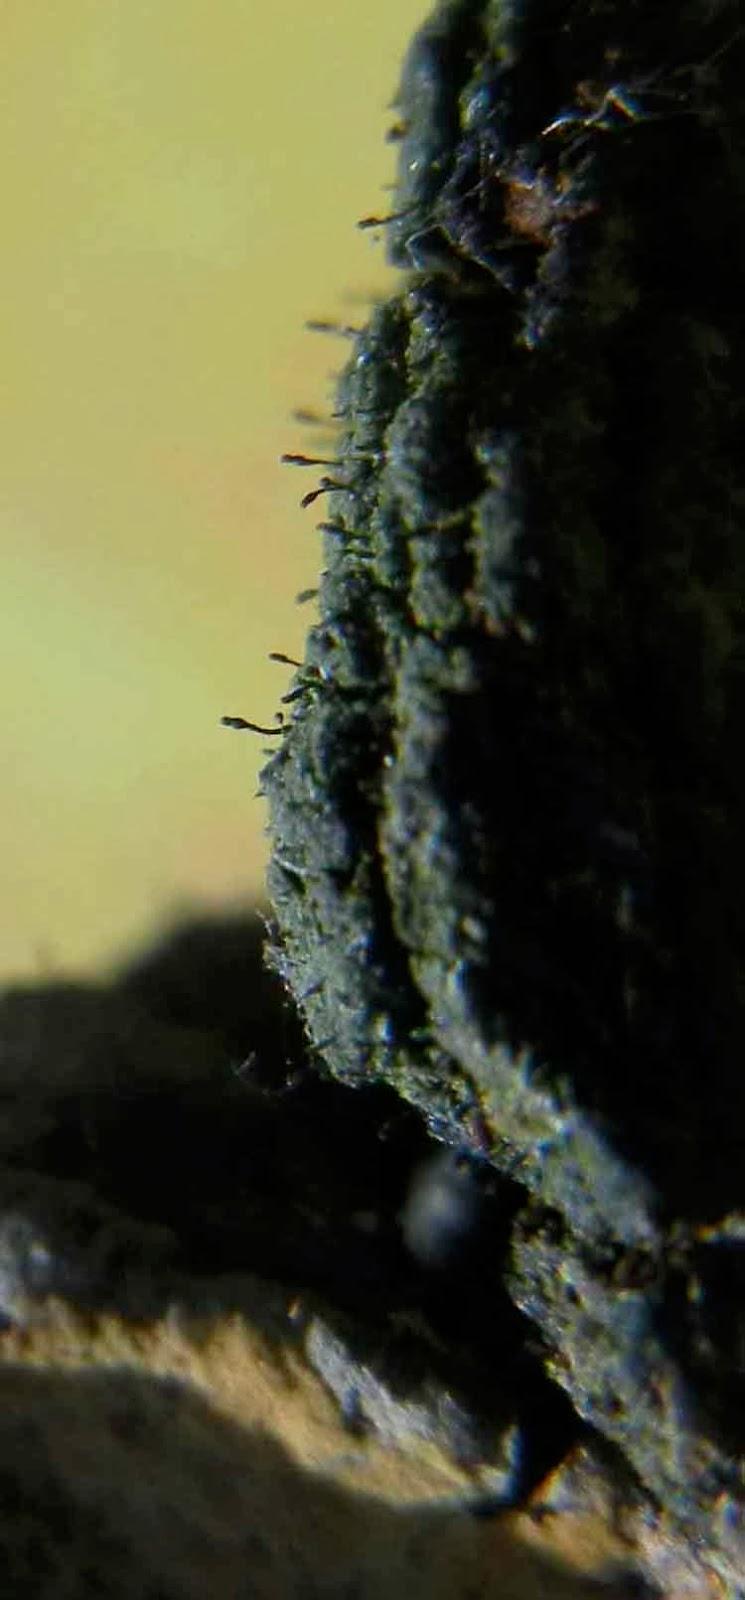 Chaenotheca brunneola less than 1mm